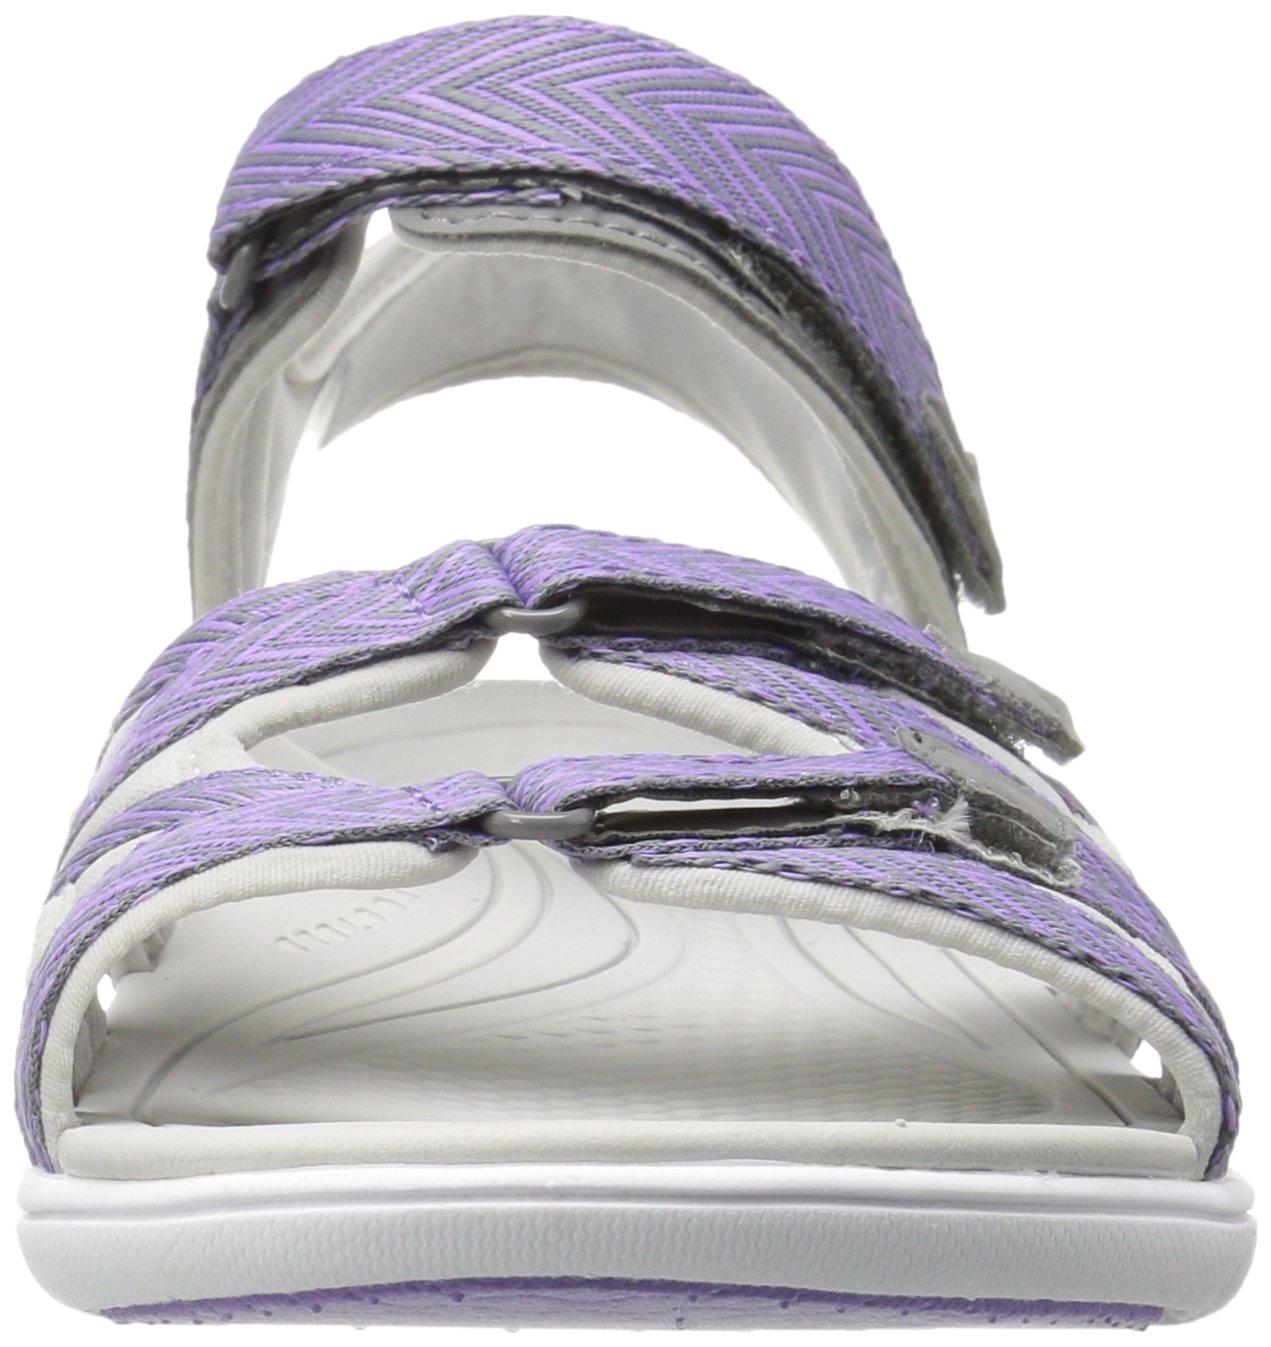 Ryka 7.5 Women's Savannah Sandal B01KWH6NGU 7.5 Ryka B(M) US|Grey/Purpl 901a0b